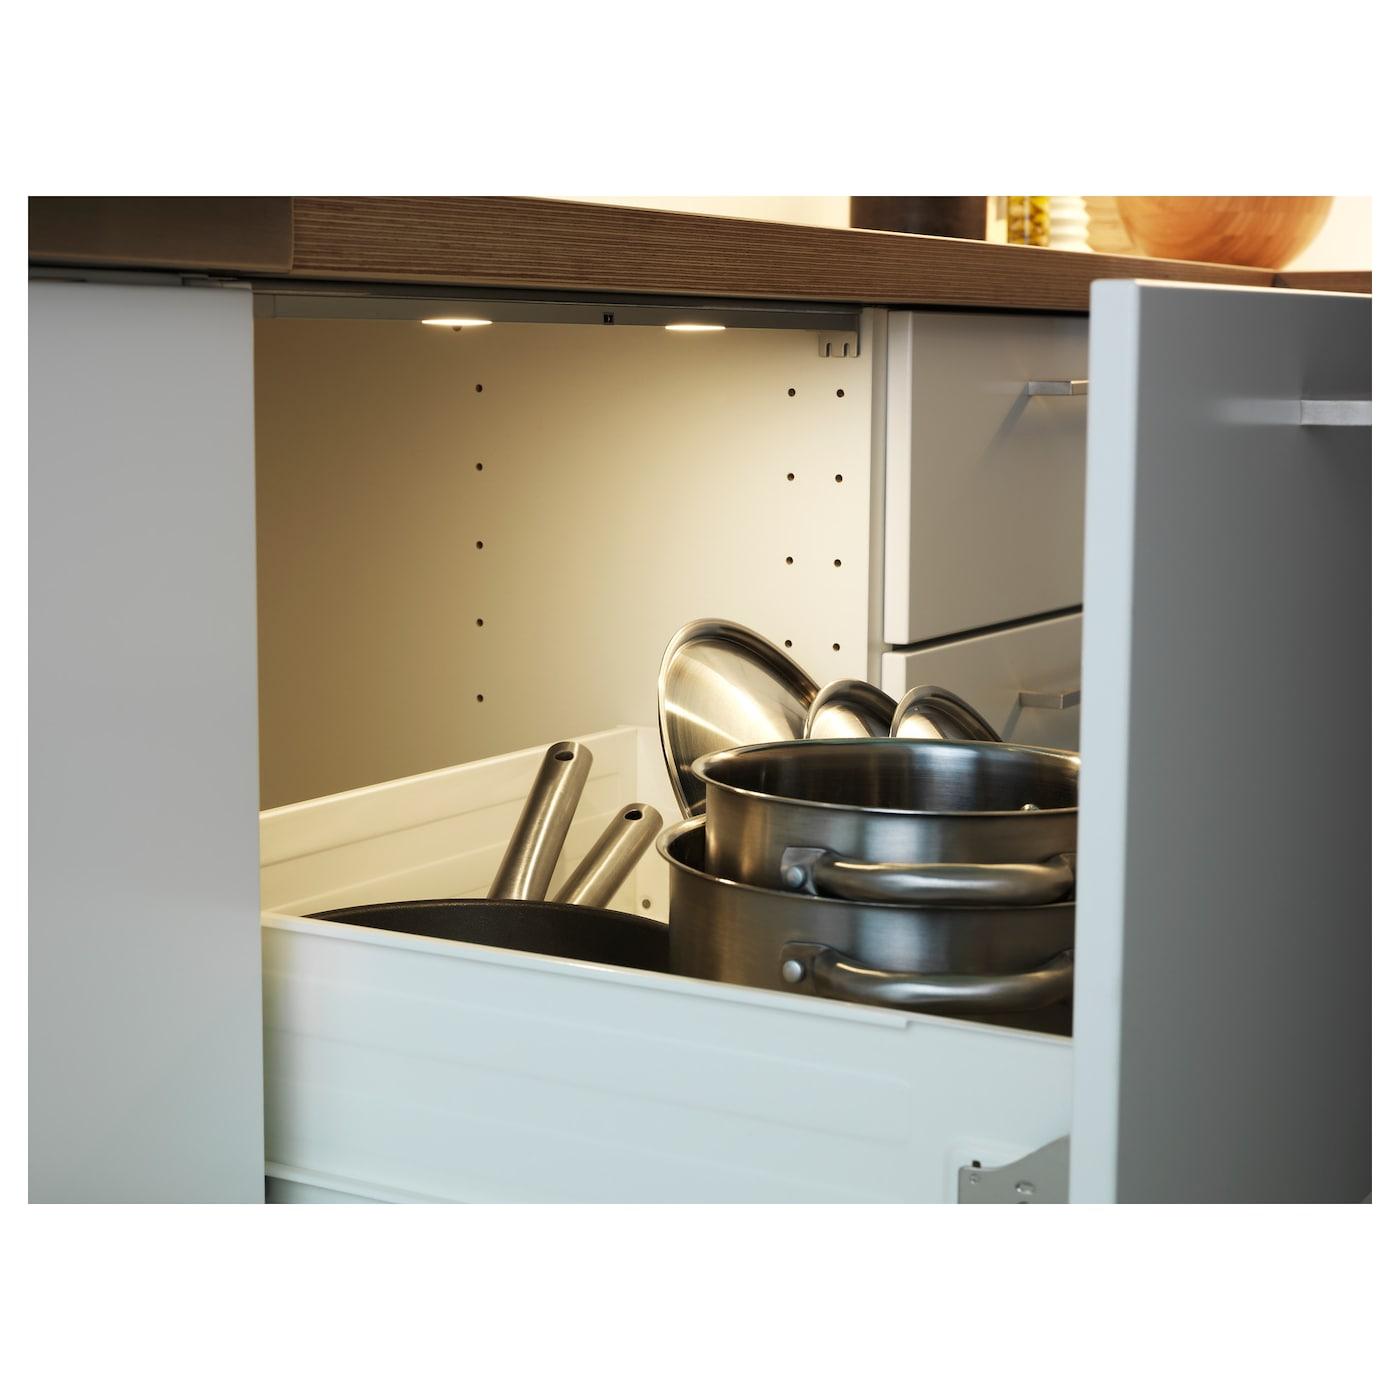 omlopp led lighting strip for drawers aluminium colour 36 cm ikea. Black Bedroom Furniture Sets. Home Design Ideas